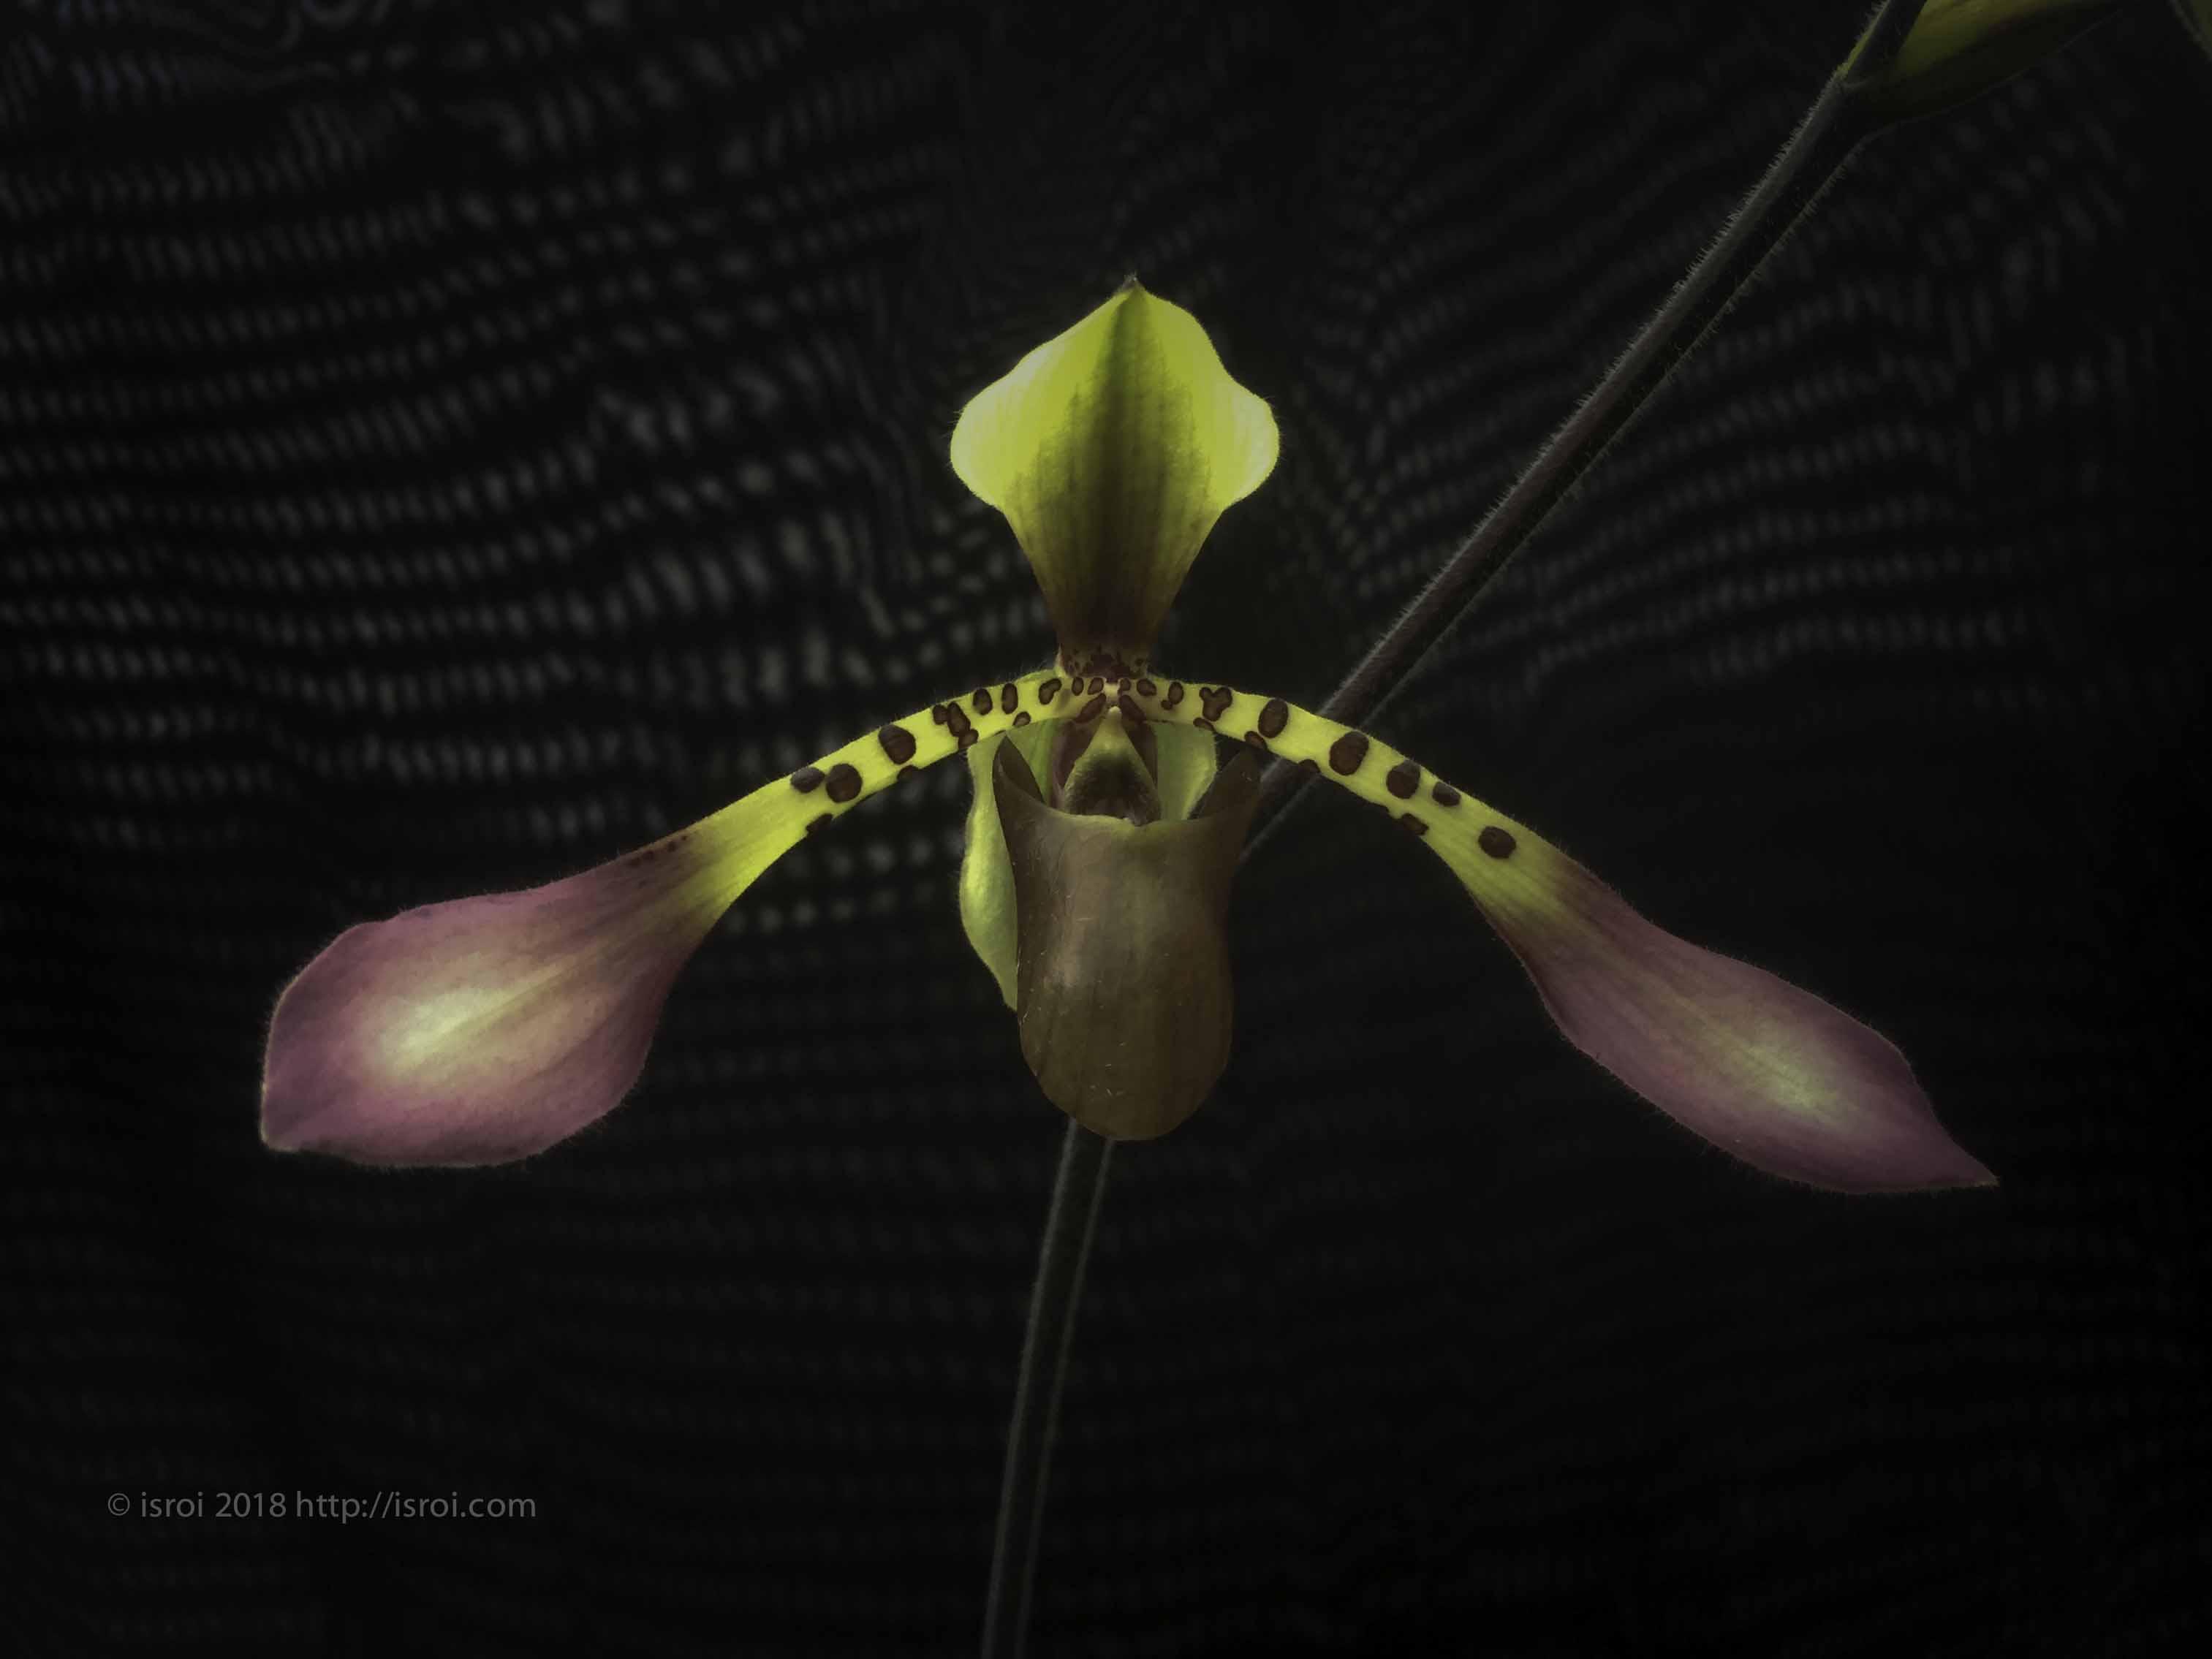 jual Anggrek kantong spesies Paphiopedilum lowii